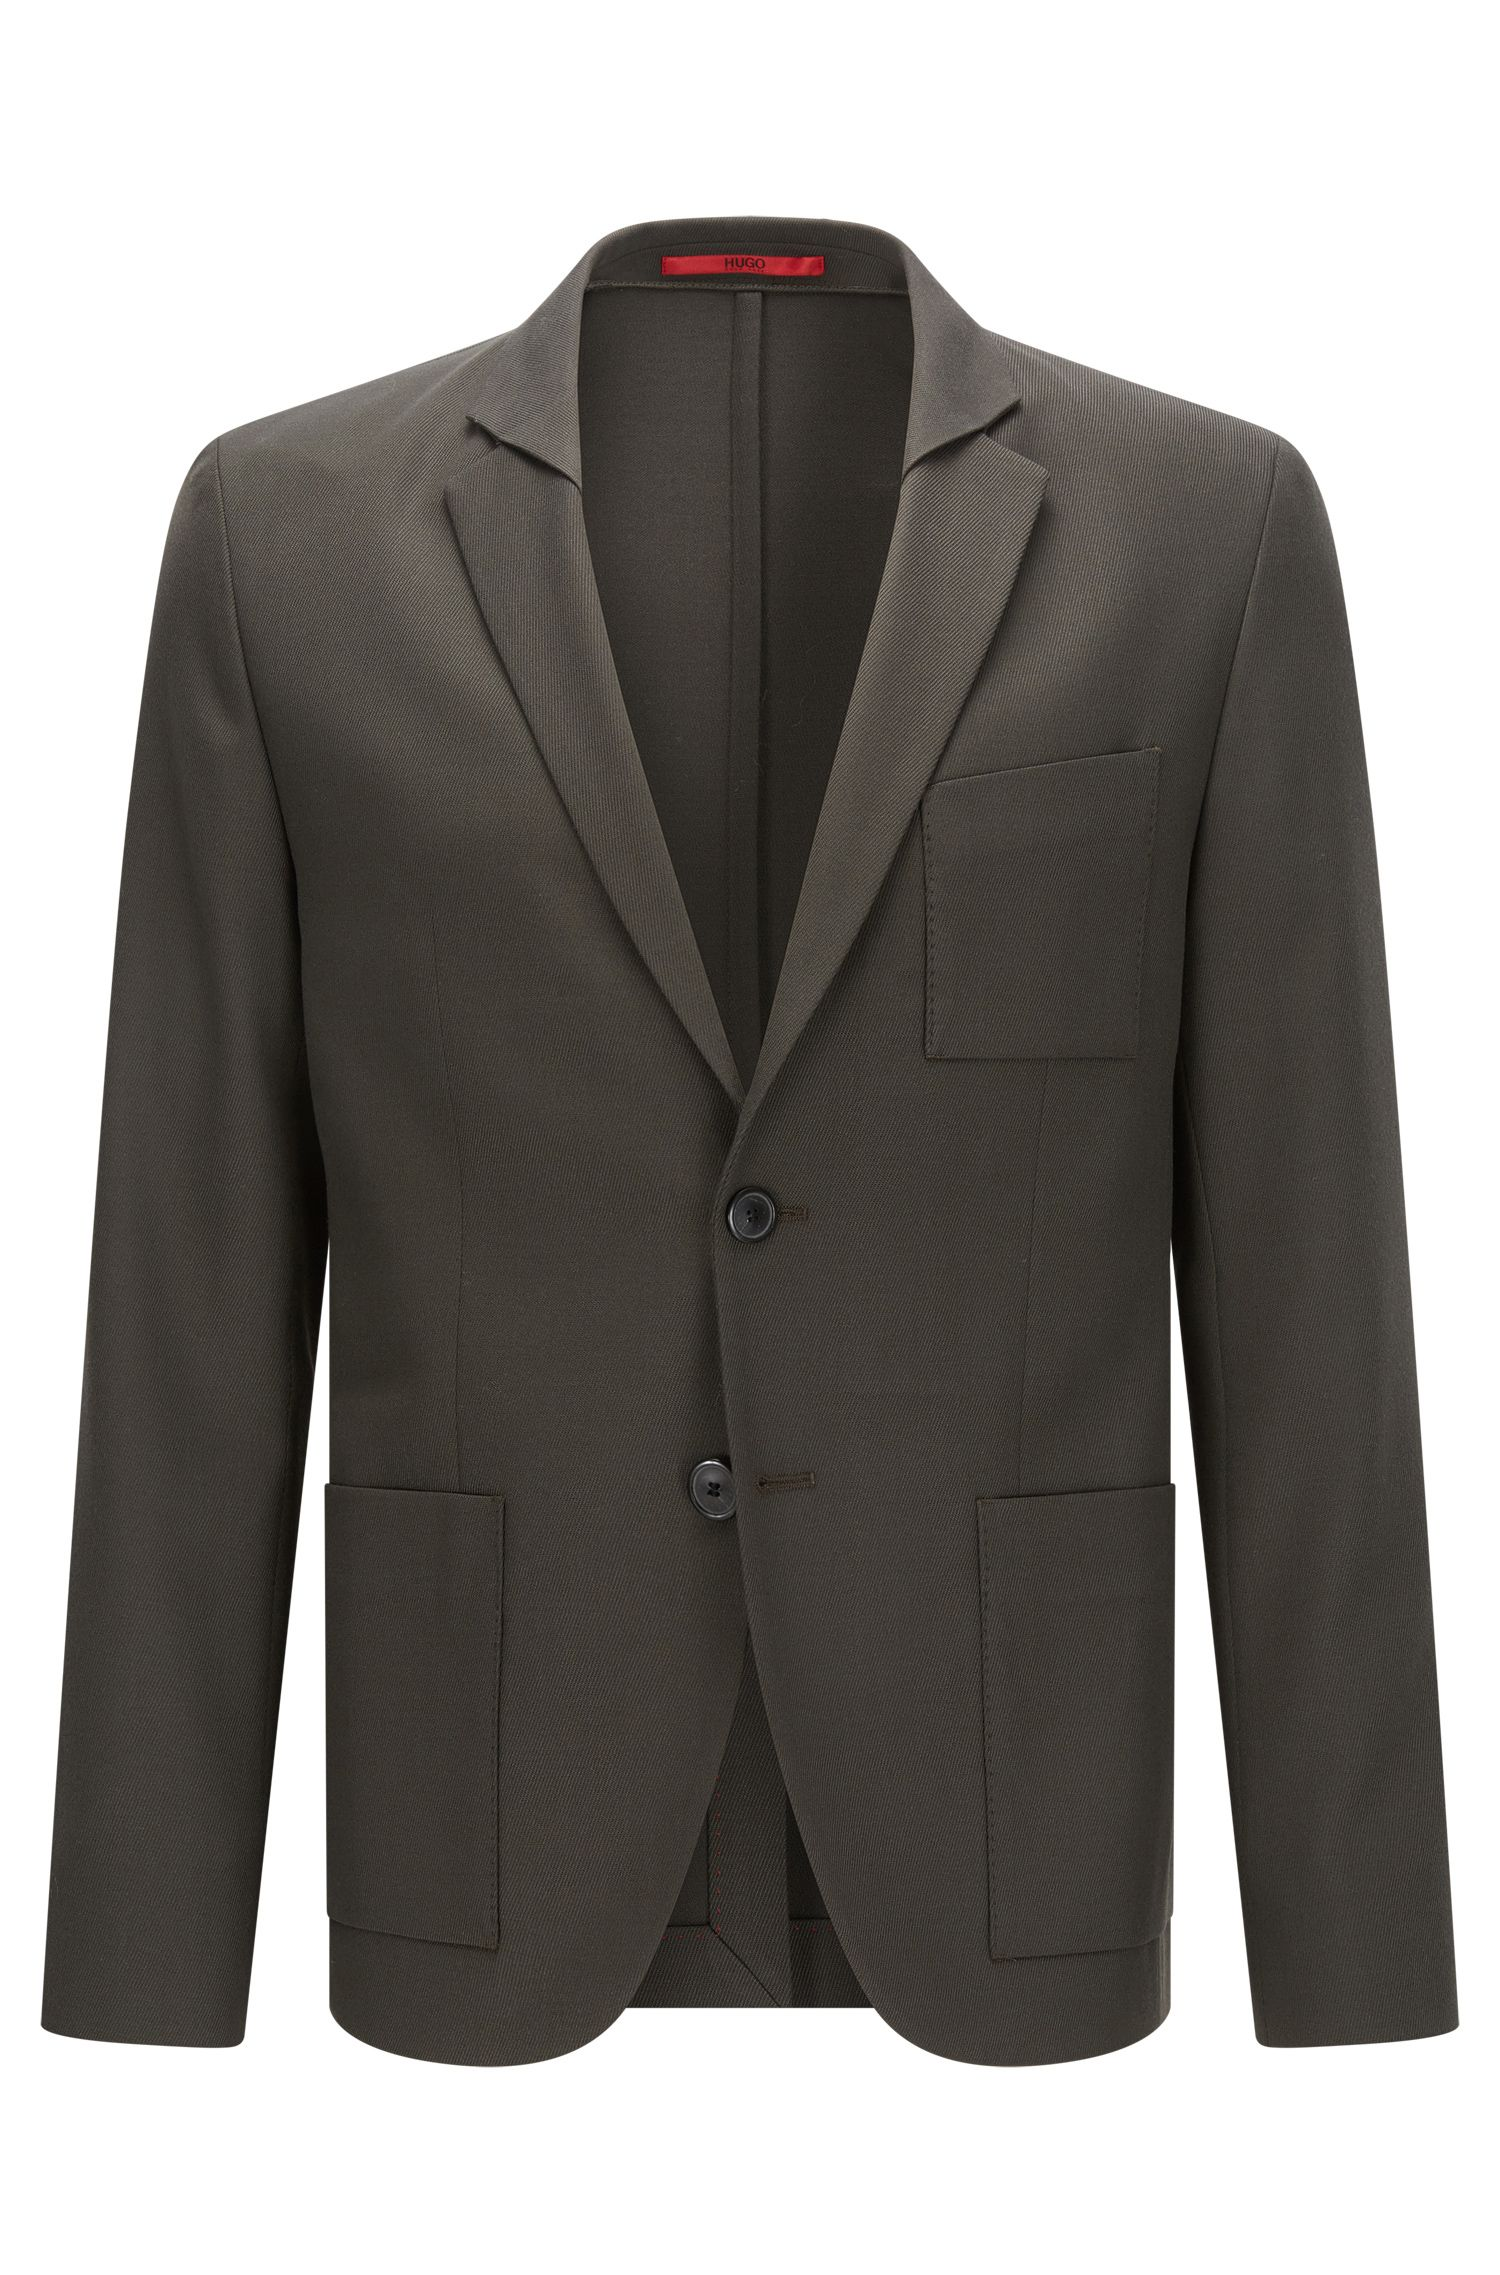 Wool Blend Sport Coat, Extra Slim Fit | Arthor